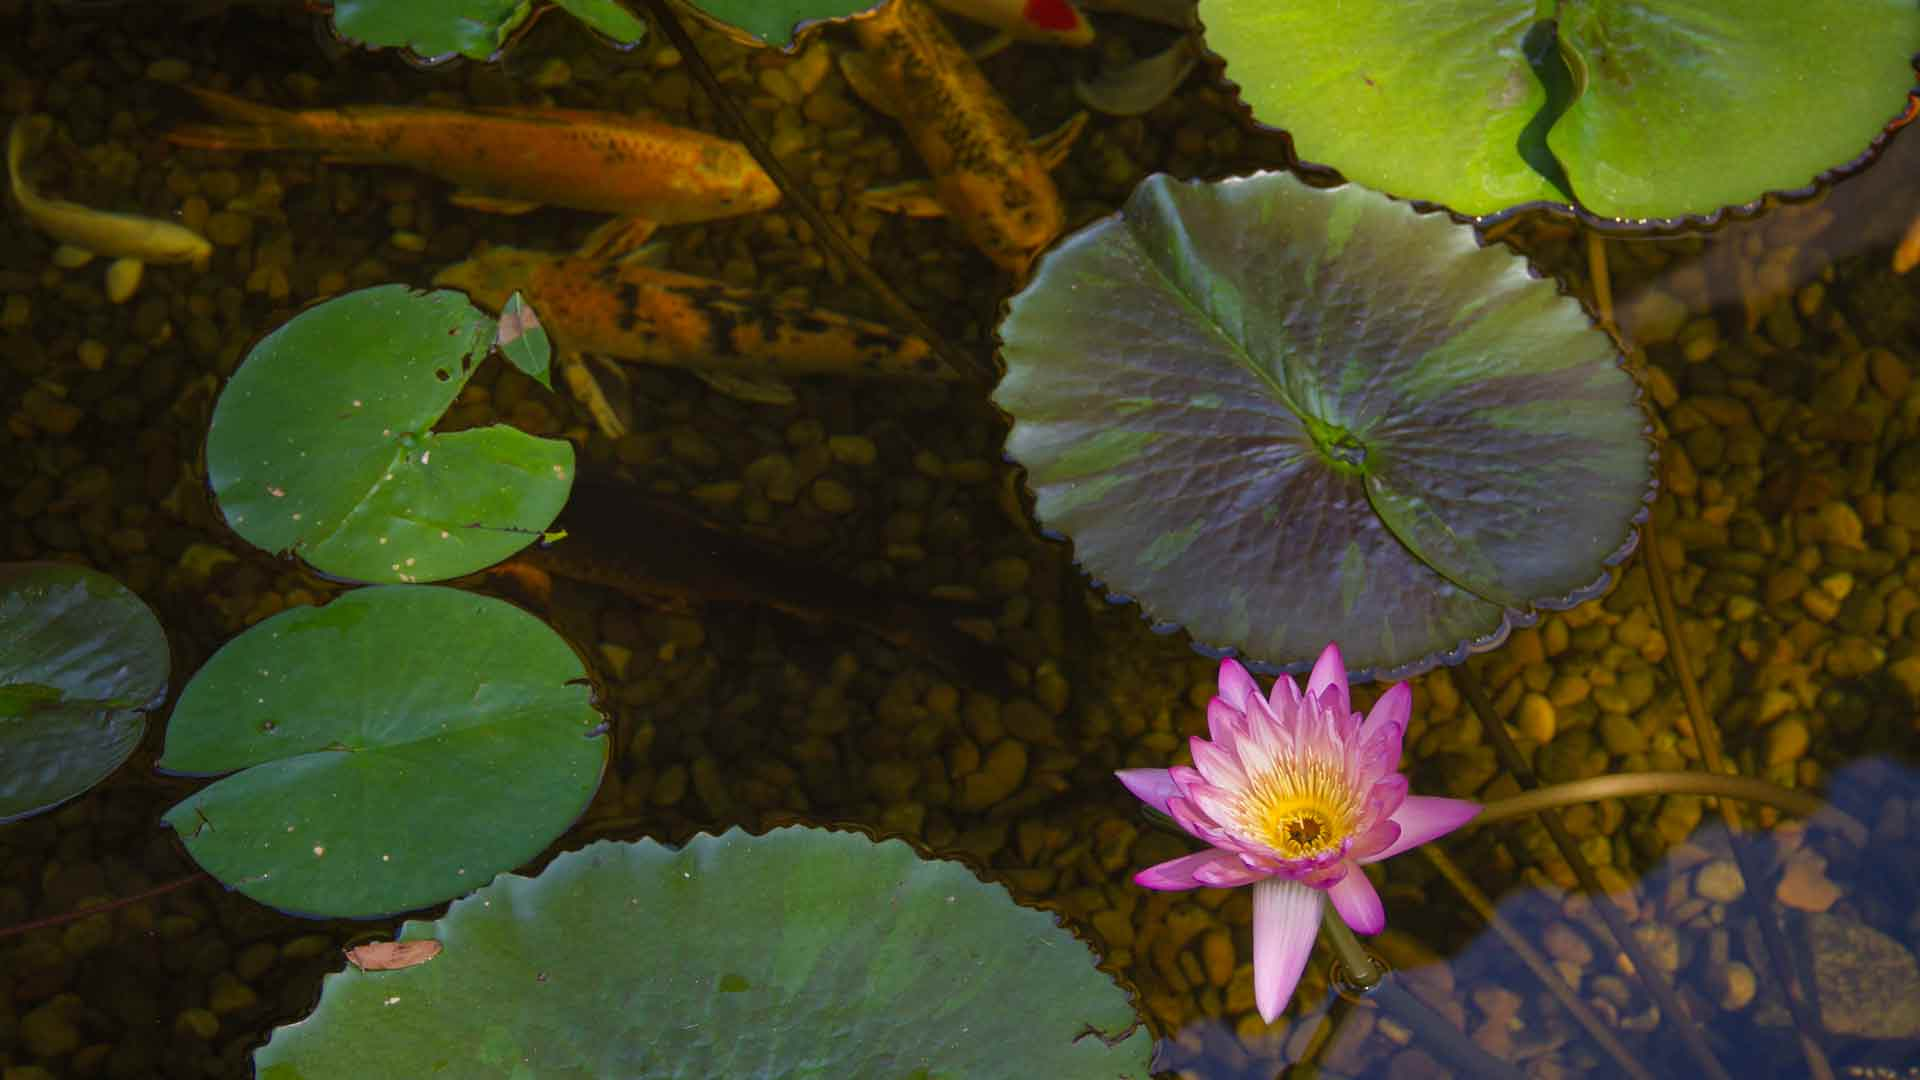 Auburn-Sky-Landscaping-Pond-Fish-Lily-Pad-Aquatic-Plants-.jpg